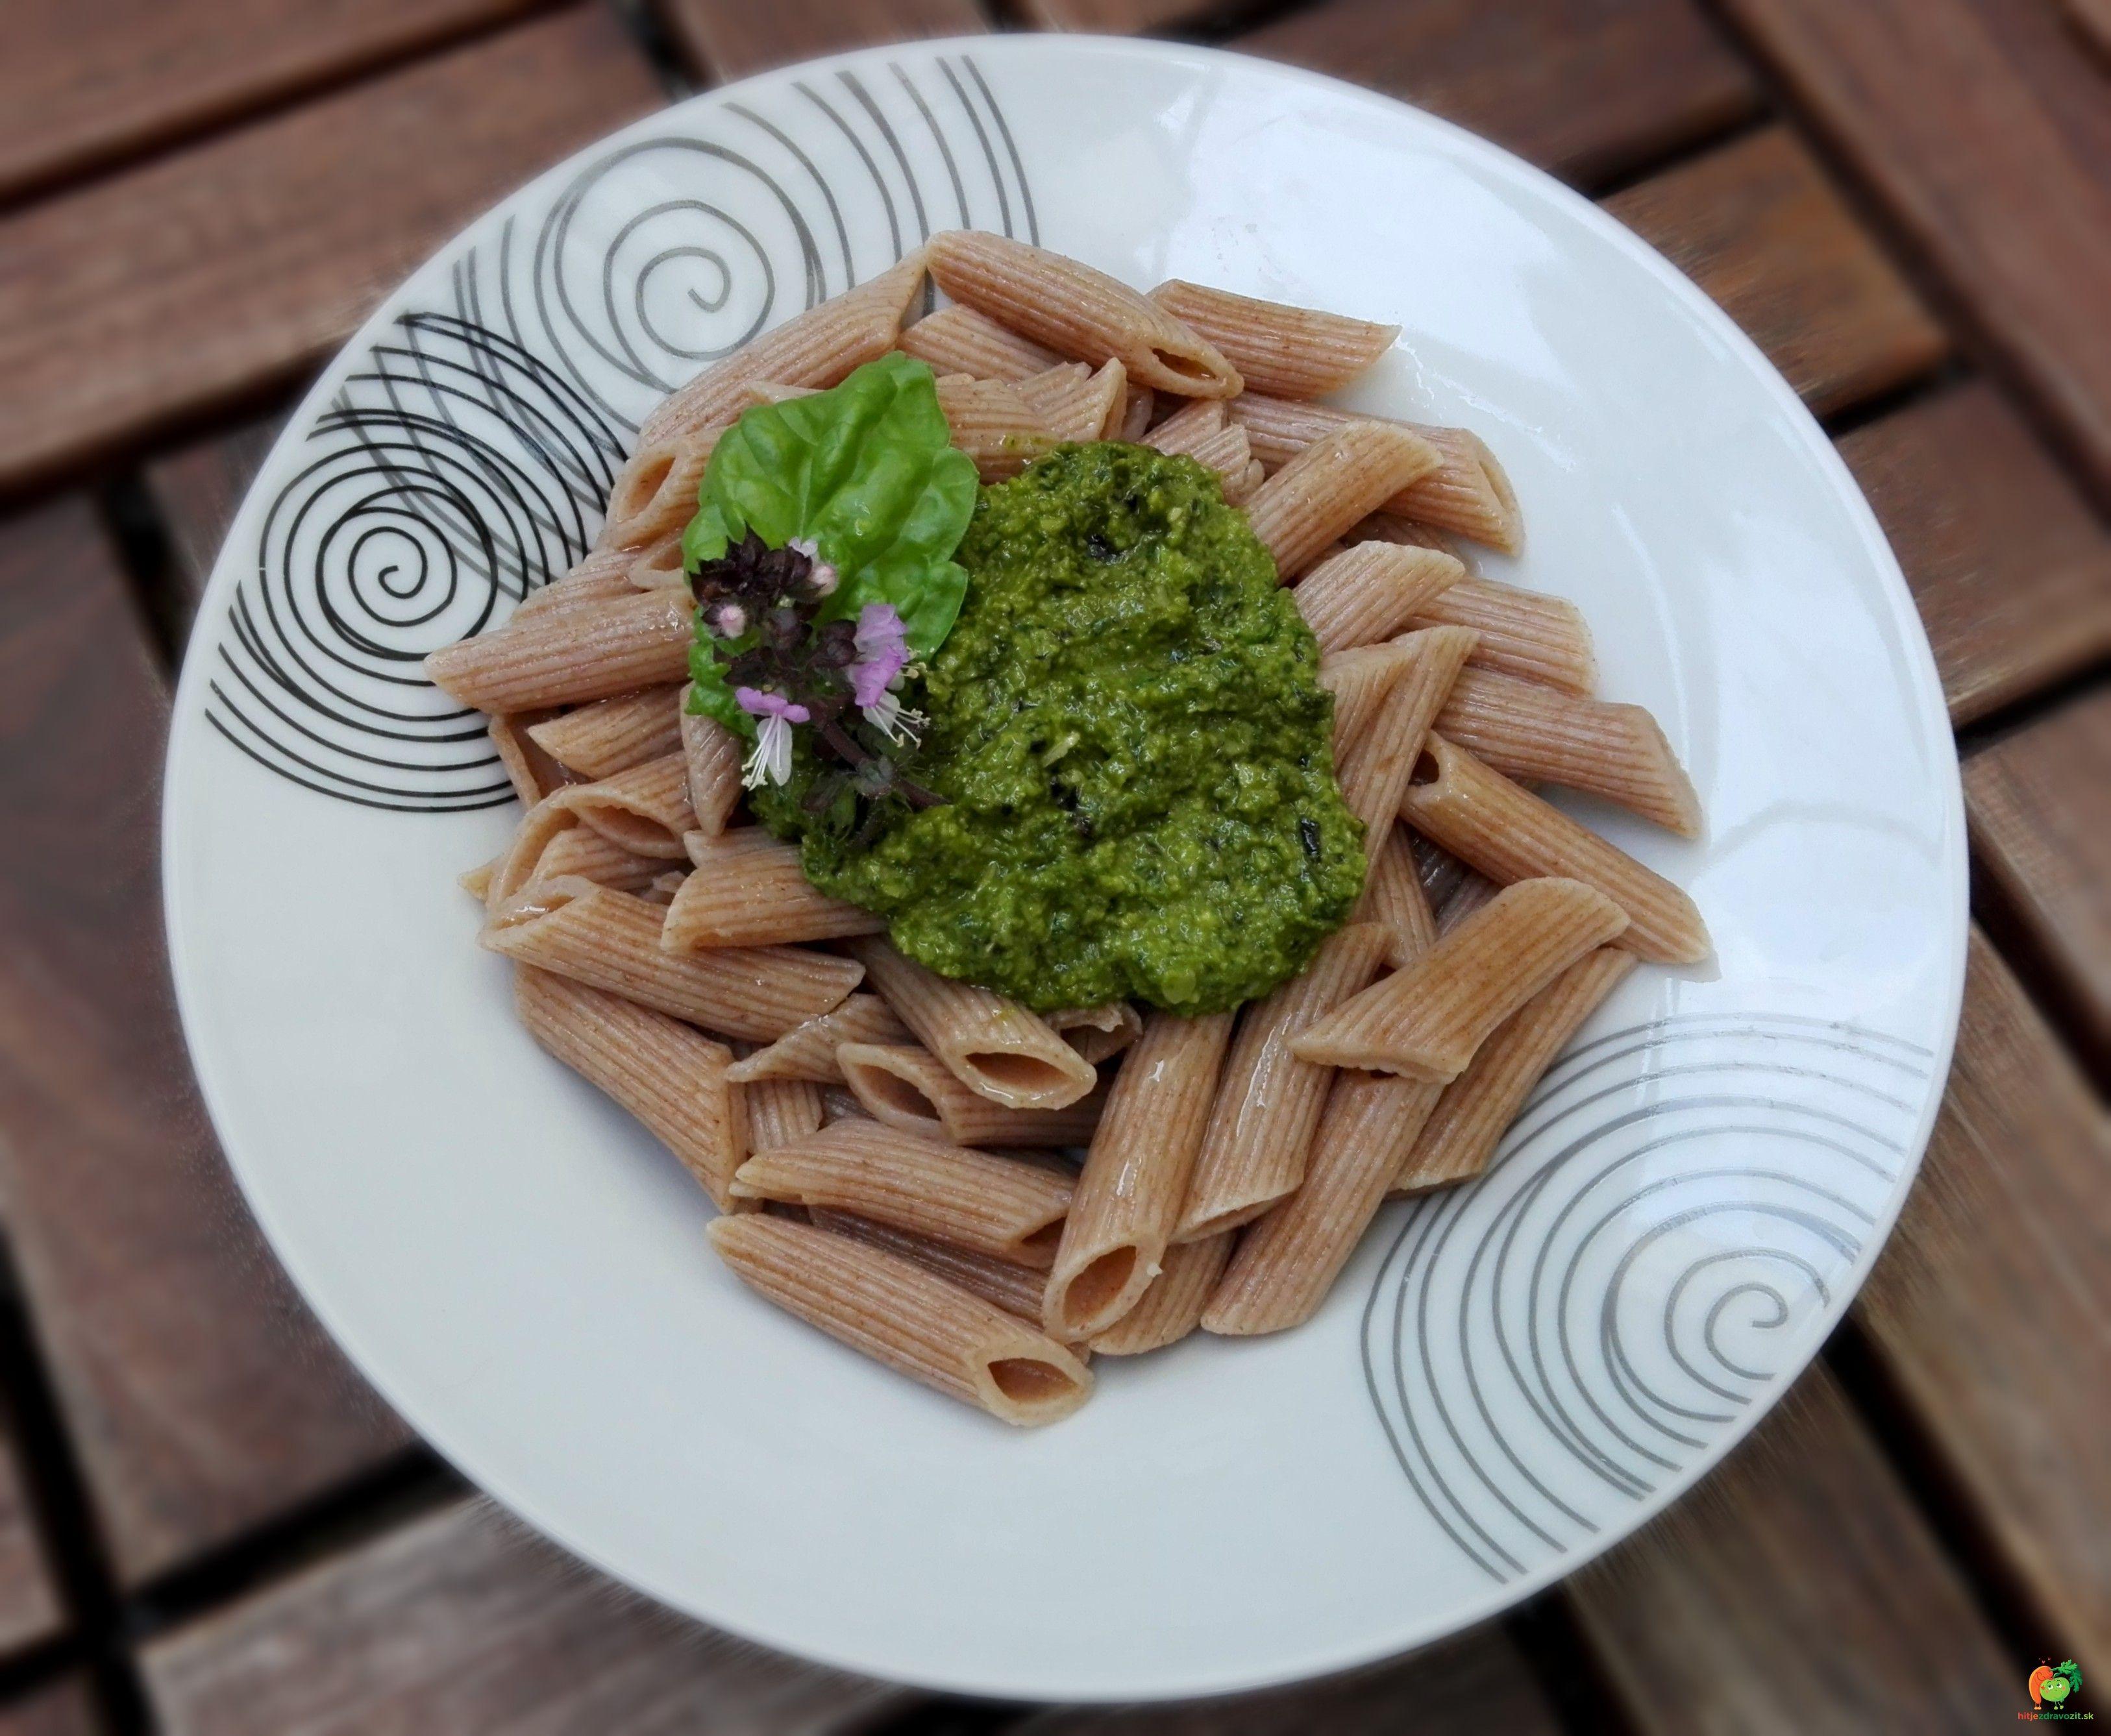 Bazalkove pesto #basil #pesto #penne #italian #food